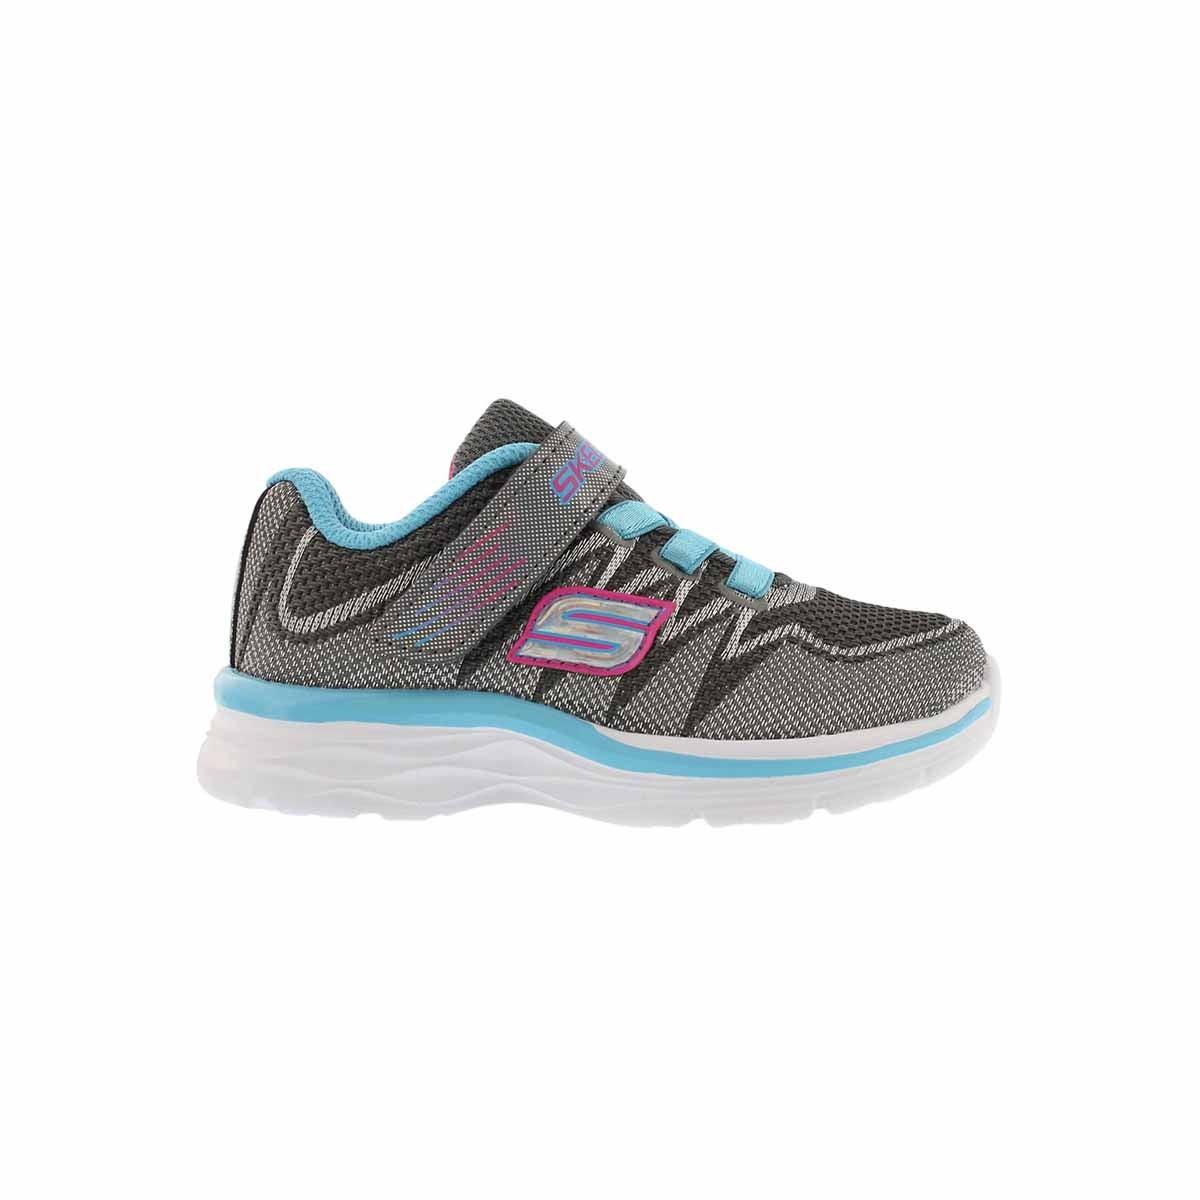 Infs-g Dream N' Dash grey/blue sneaker